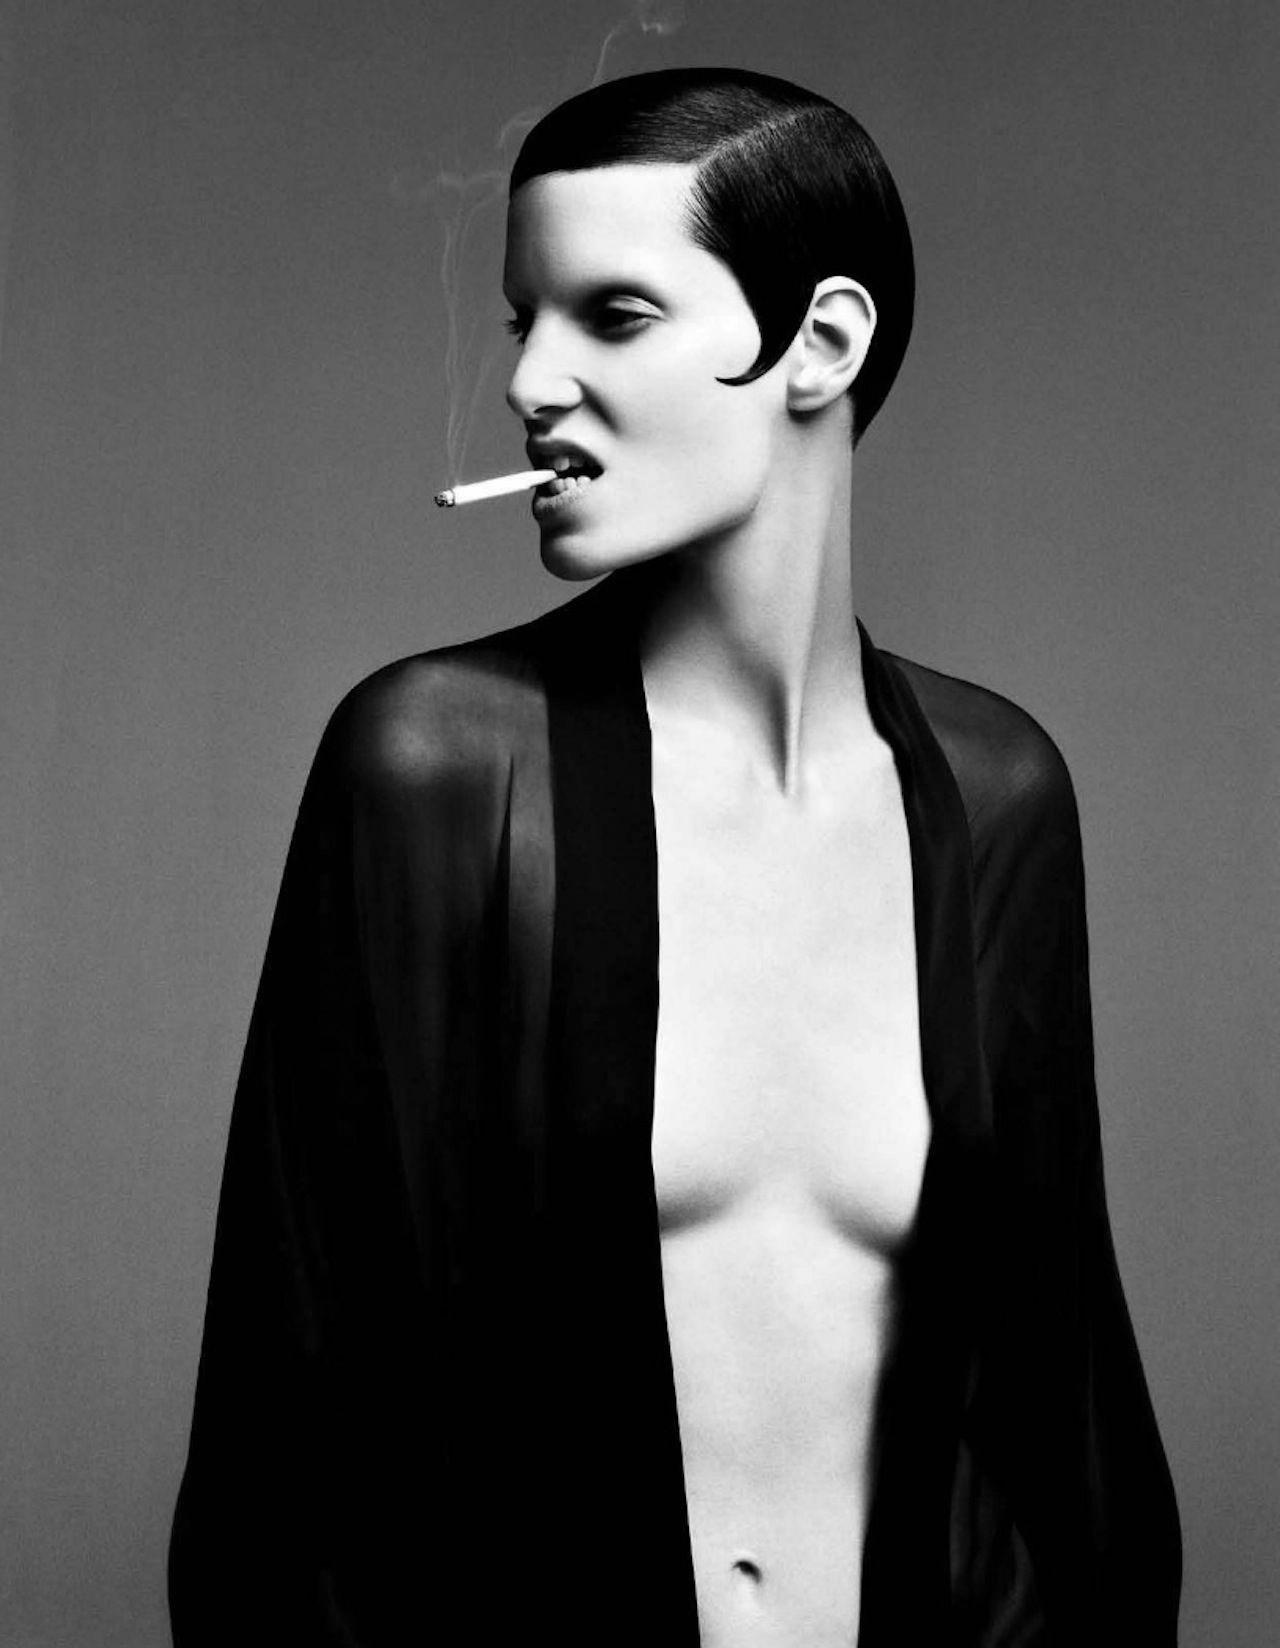 Iris_Strubegger-Daniele_Duella-Iango_Henzi-Vogue_Germany.jpeg